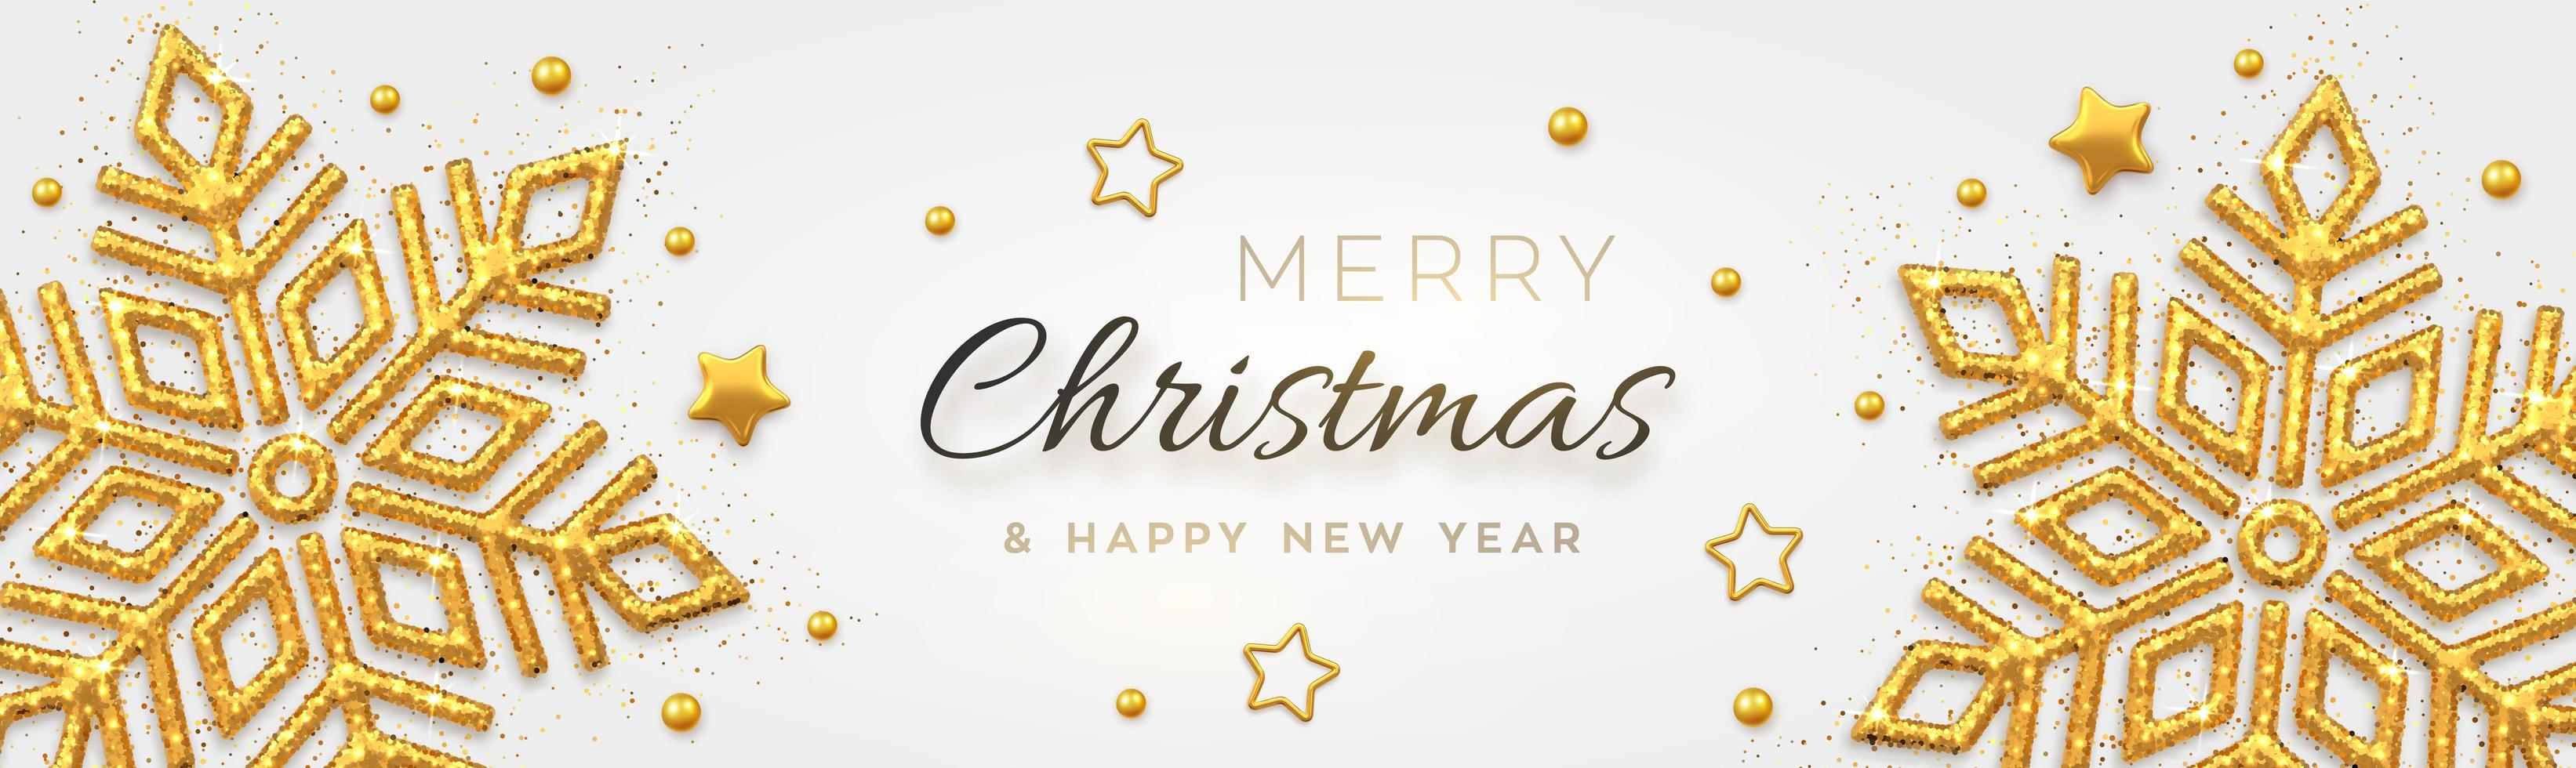 jul bakgrund med glänsande gyllene snöflingor vektor